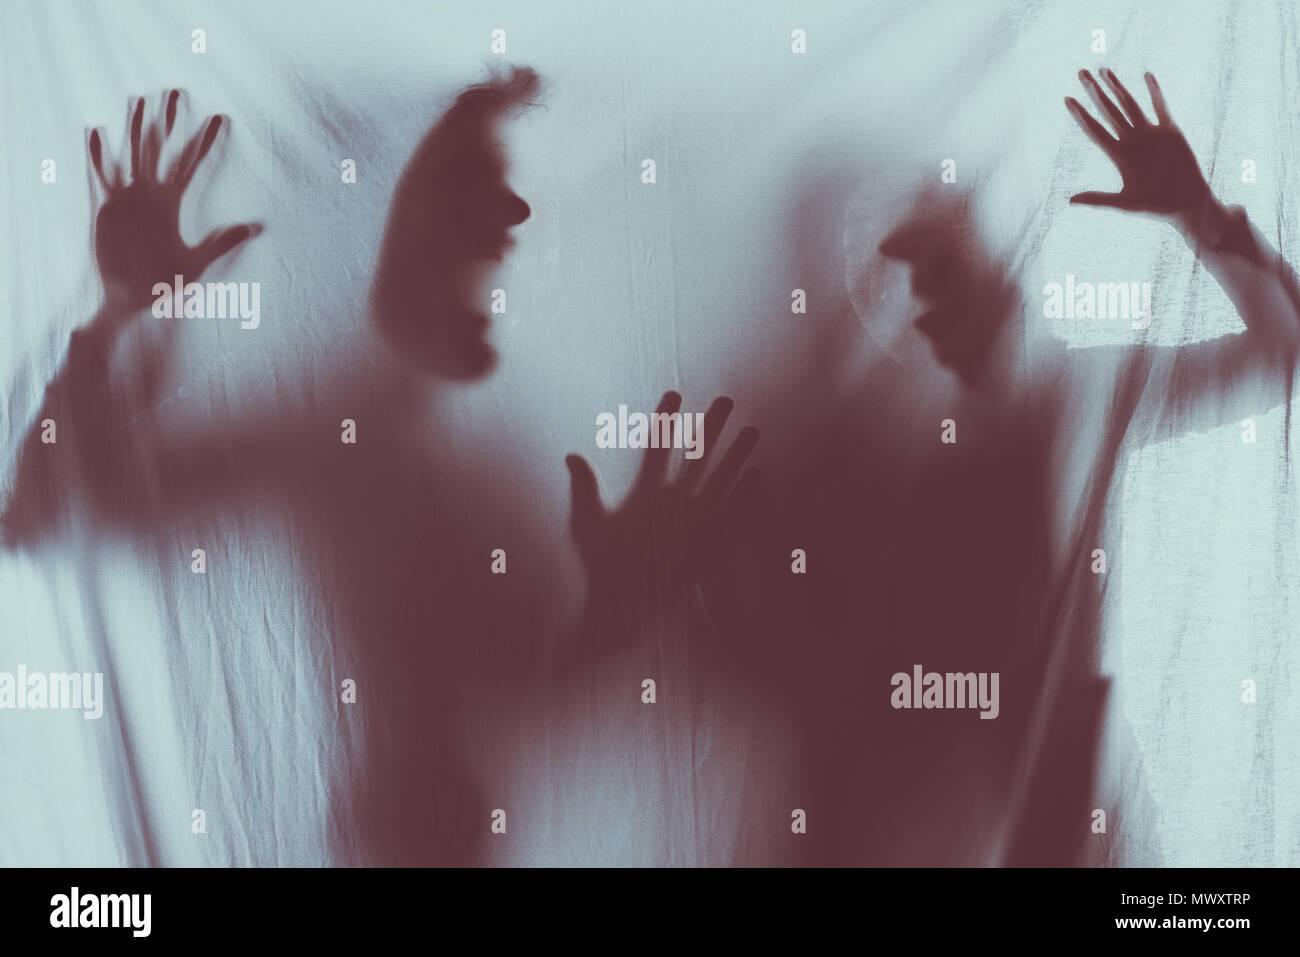 Miedo borrosas siluetas de gente gritando Imagen De Stock